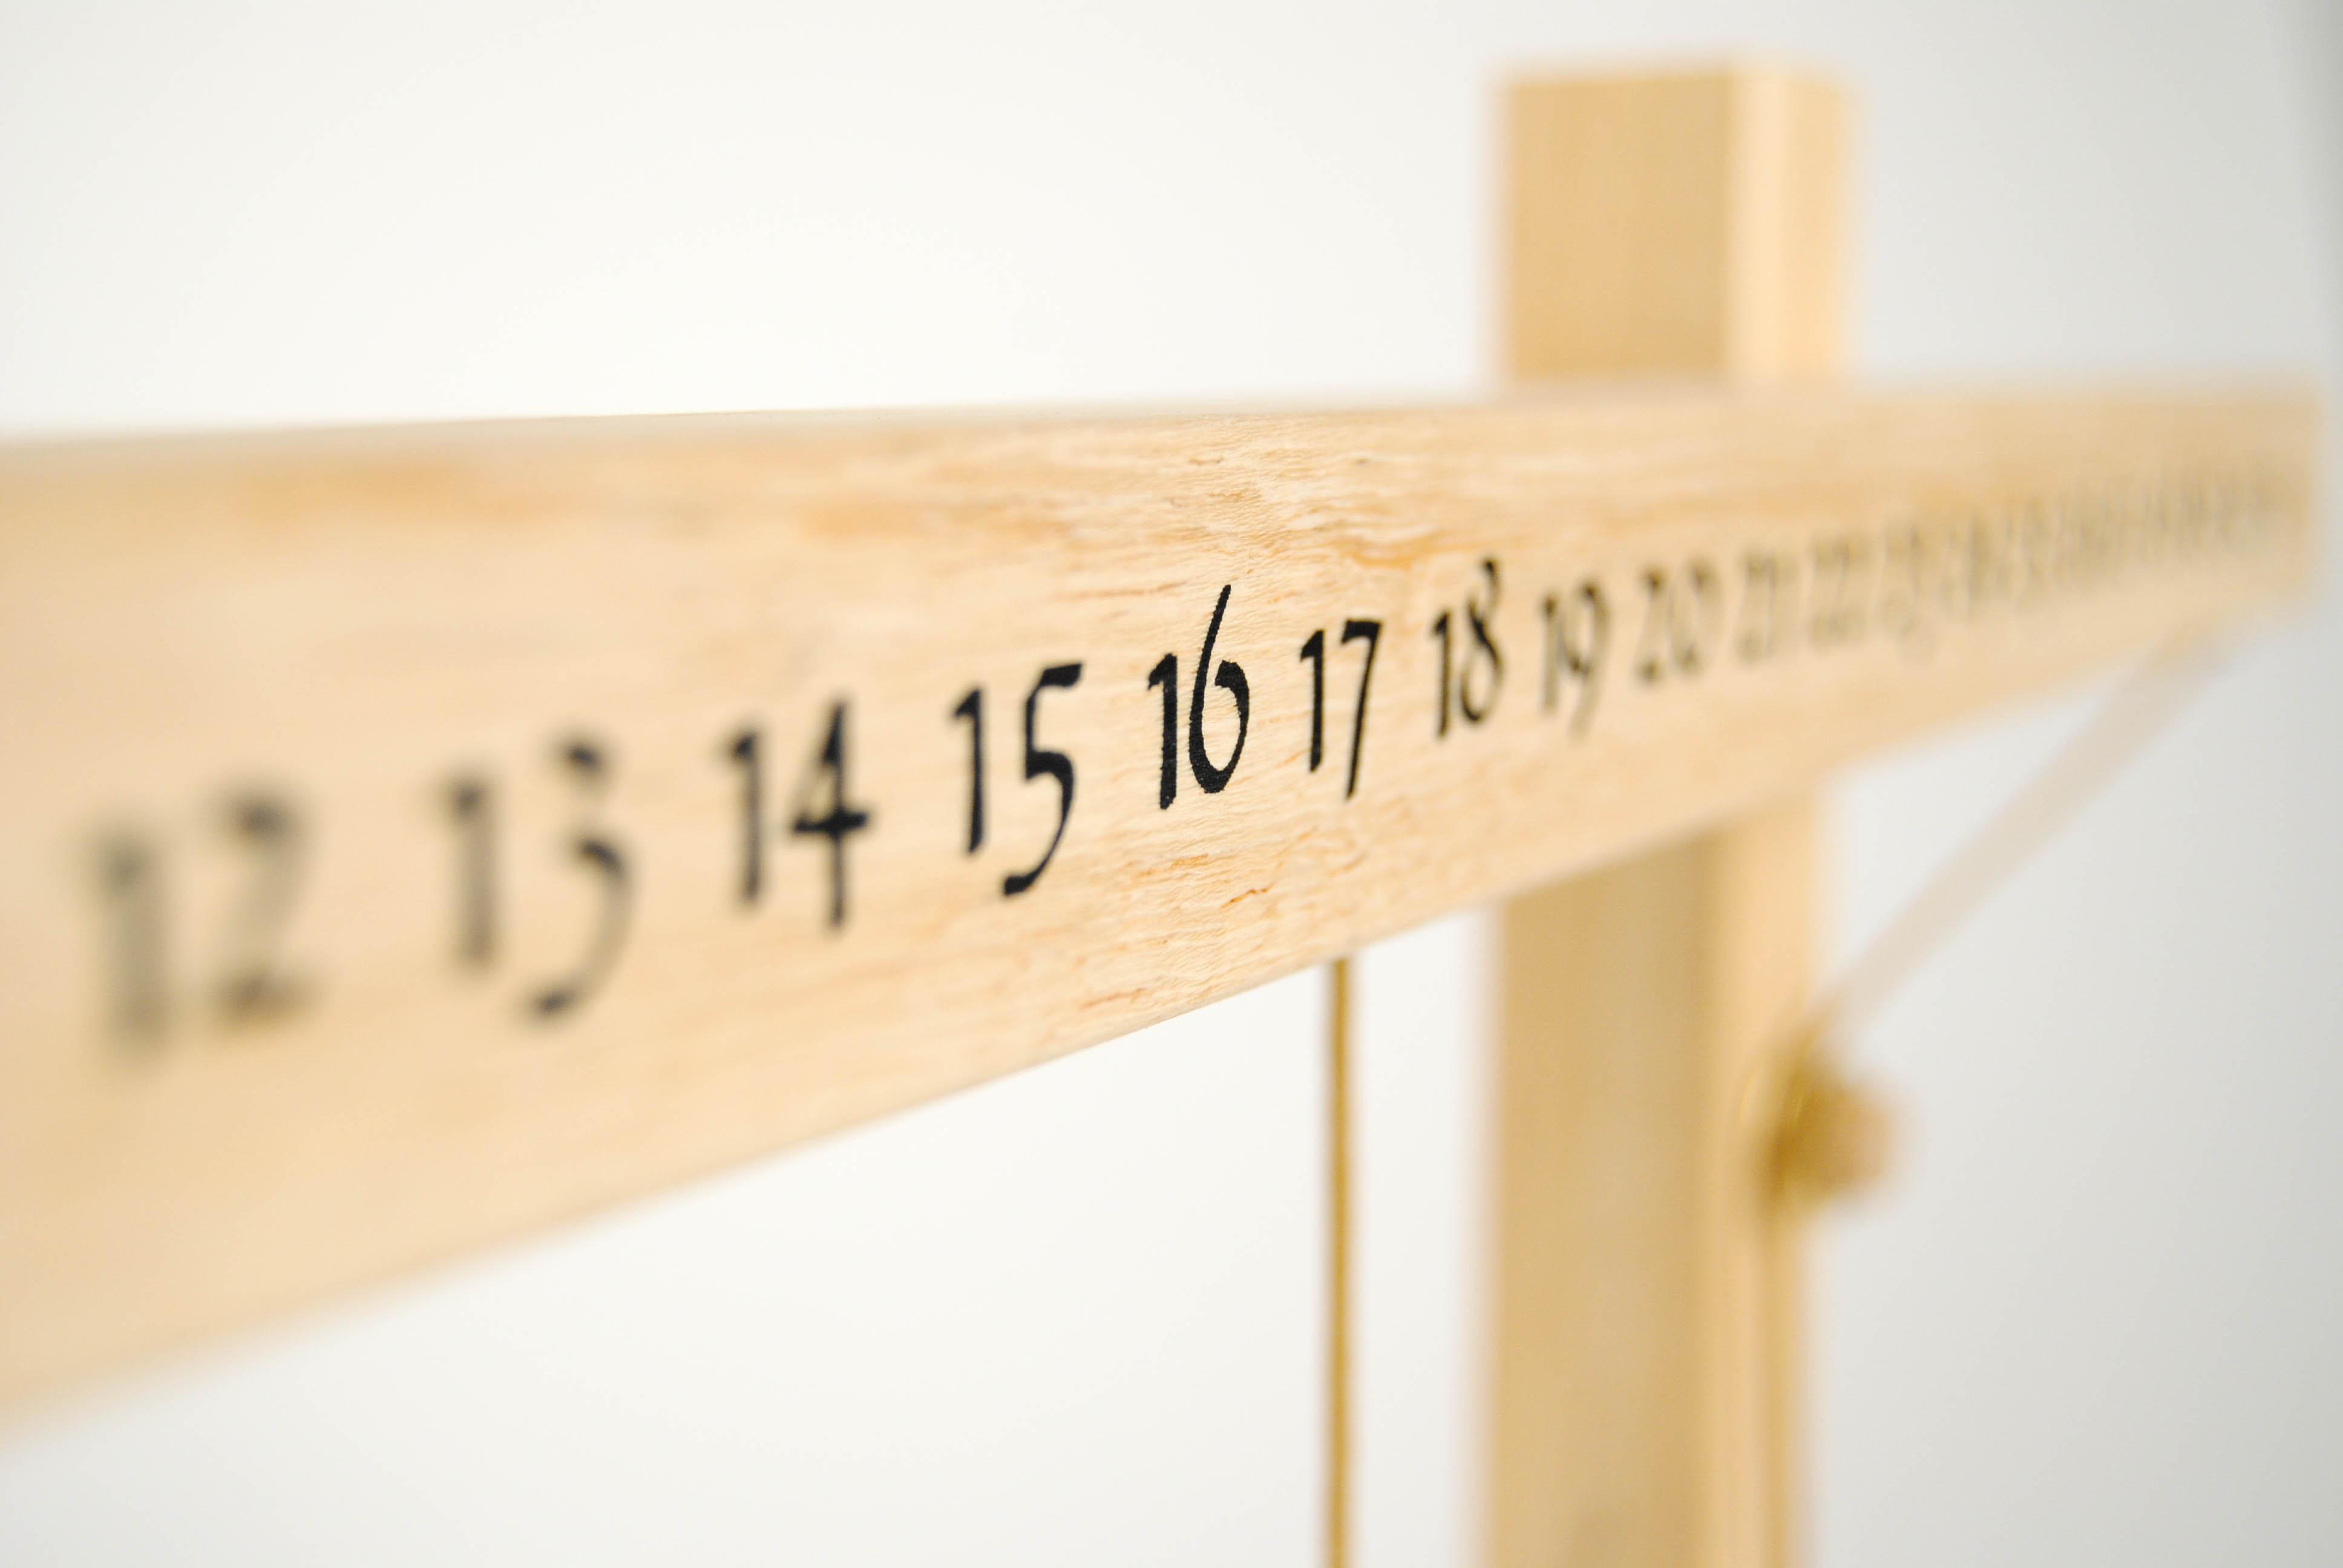 leonardo da vinci wooden calendar with printed numbers